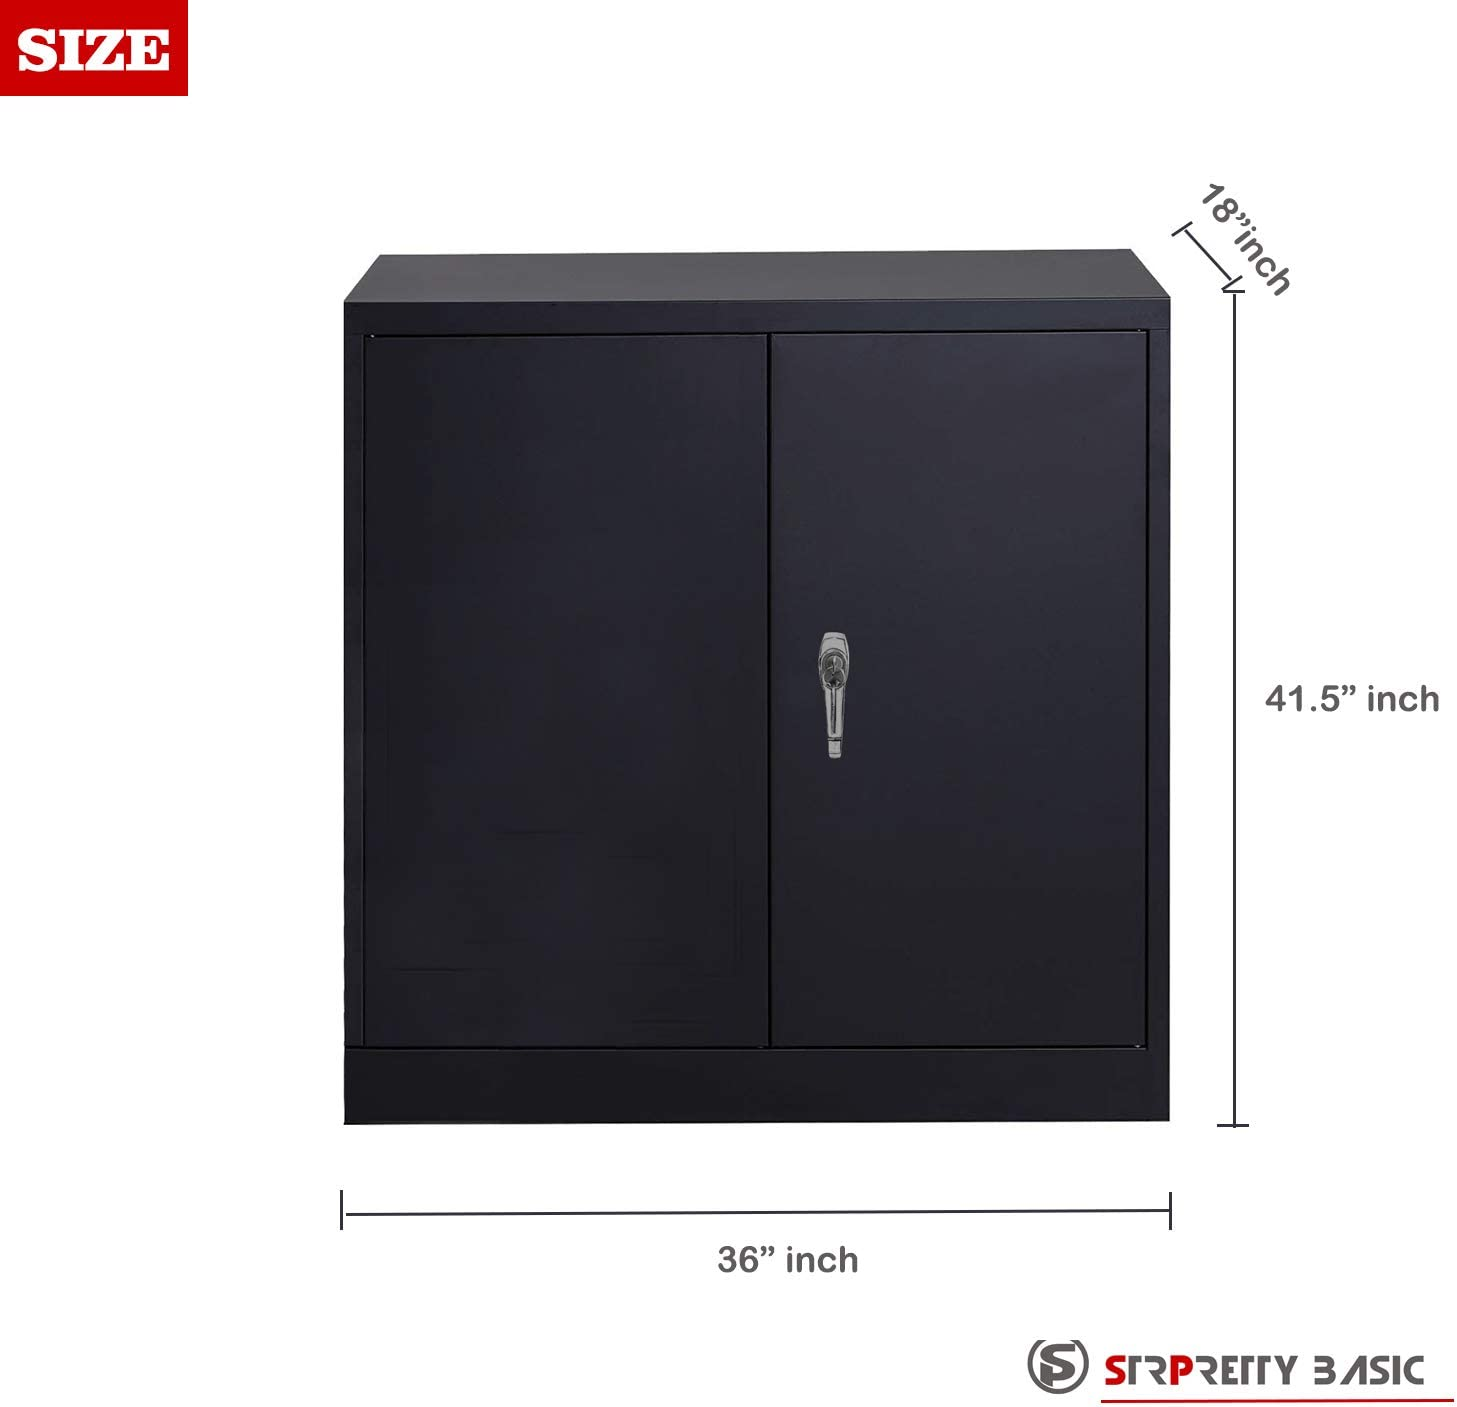 SP Home Office Storage Cabinet with 2 Adjustable Shelves Black Steel SnapIt Office Cabinet